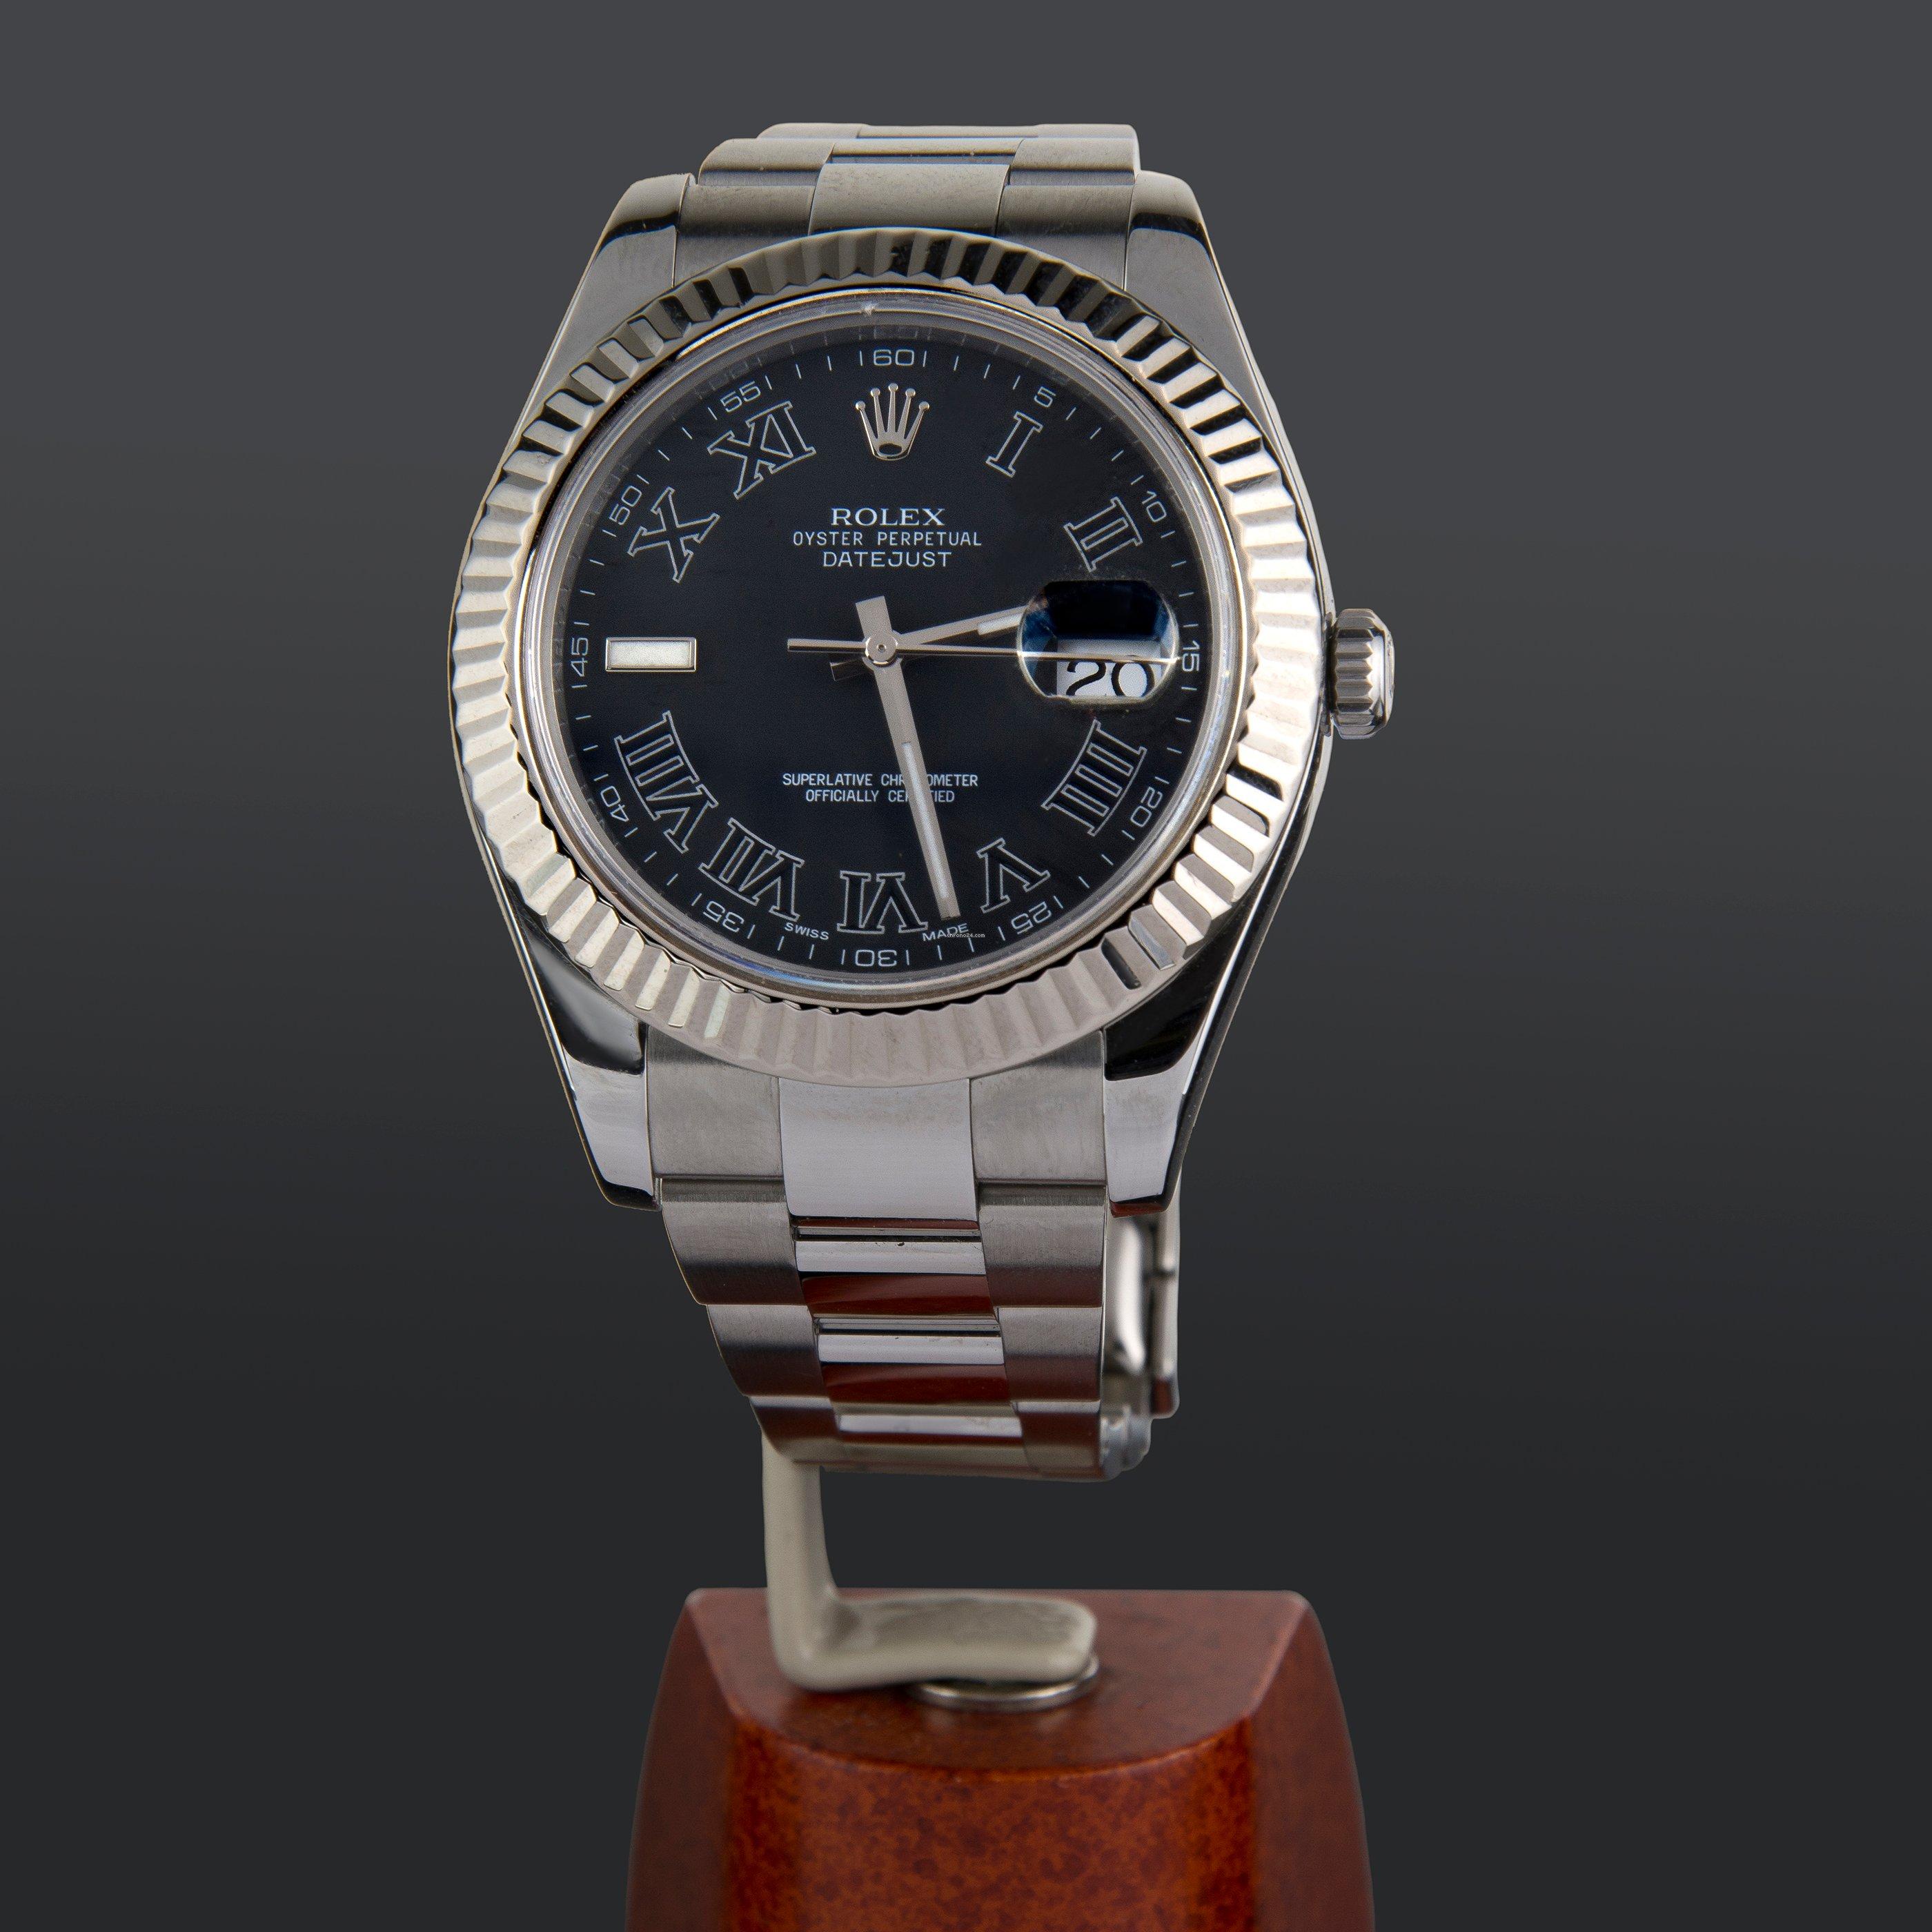 En Parte Ii Rolex € Venta 8 Datejust Un 500 Trusted Por De orBWCxde